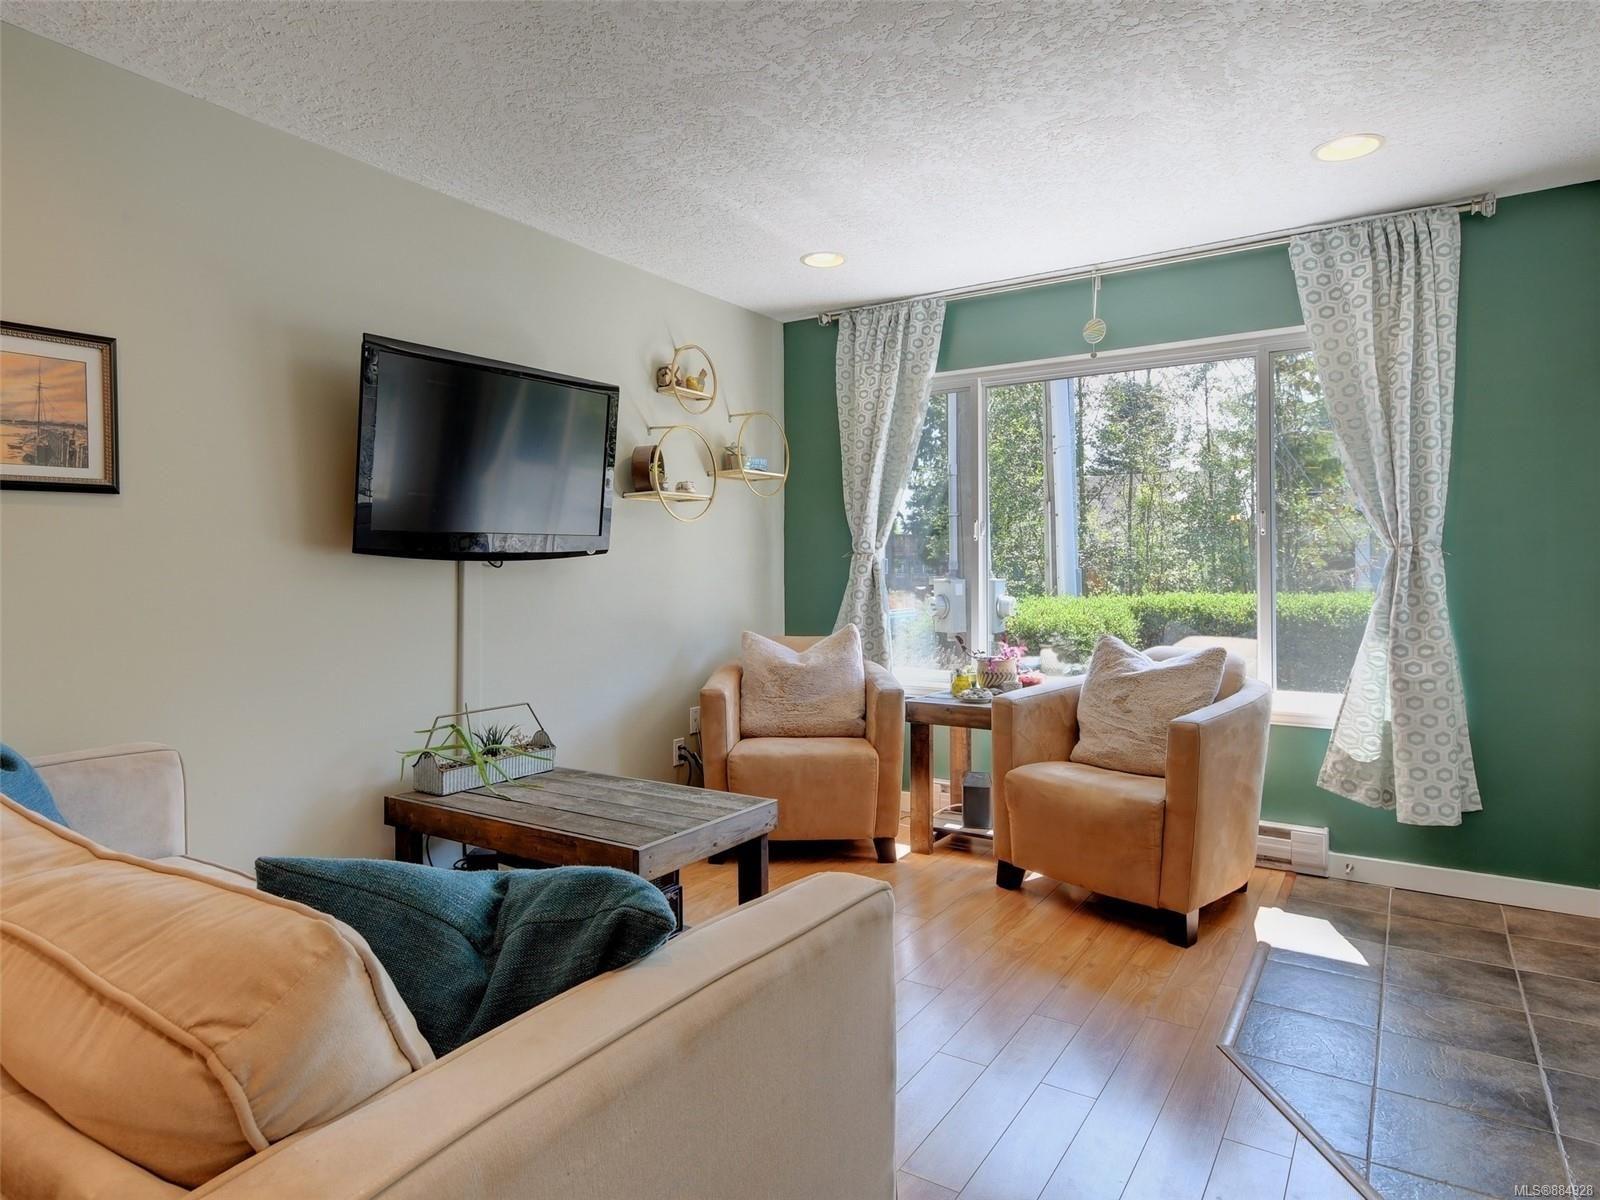 Photo 3: Photos: 6896 Beaton Rd in : Sk Broomhill Half Duplex for sale (Sooke)  : MLS®# 884928